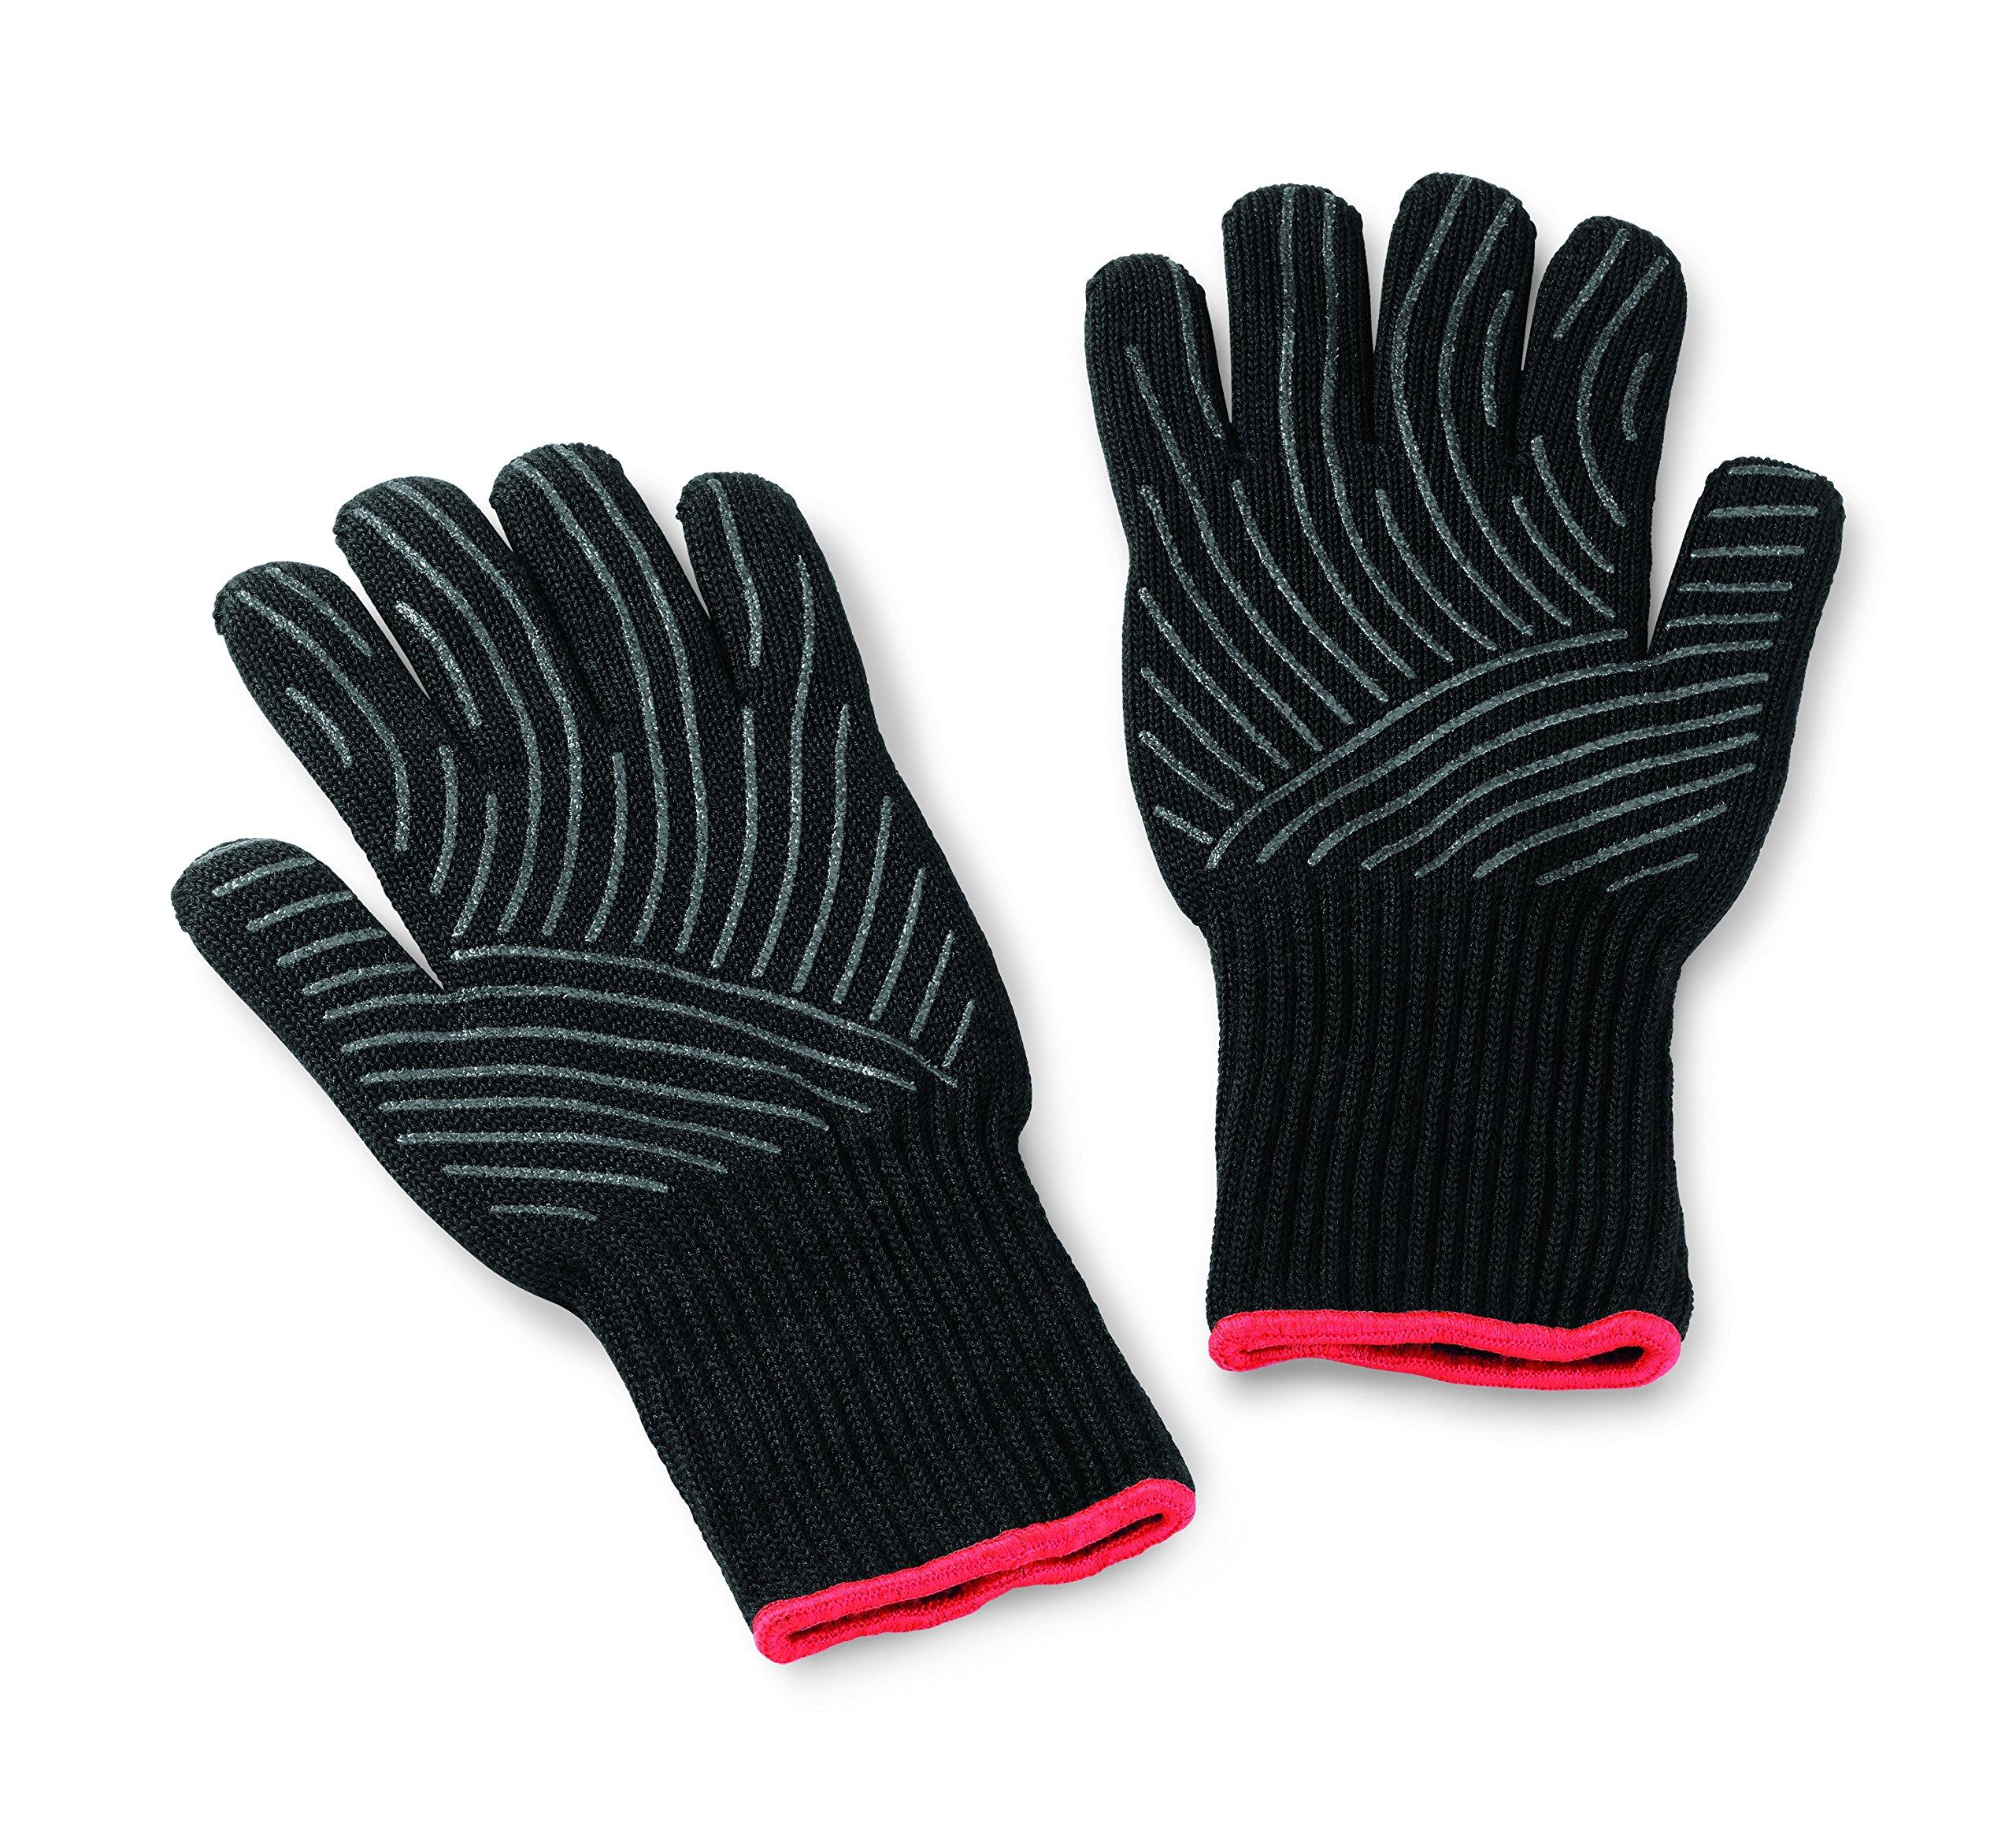 Weber 6670 Large/X-Large Premium Barbeque Glove Set by Weber (Image #1)